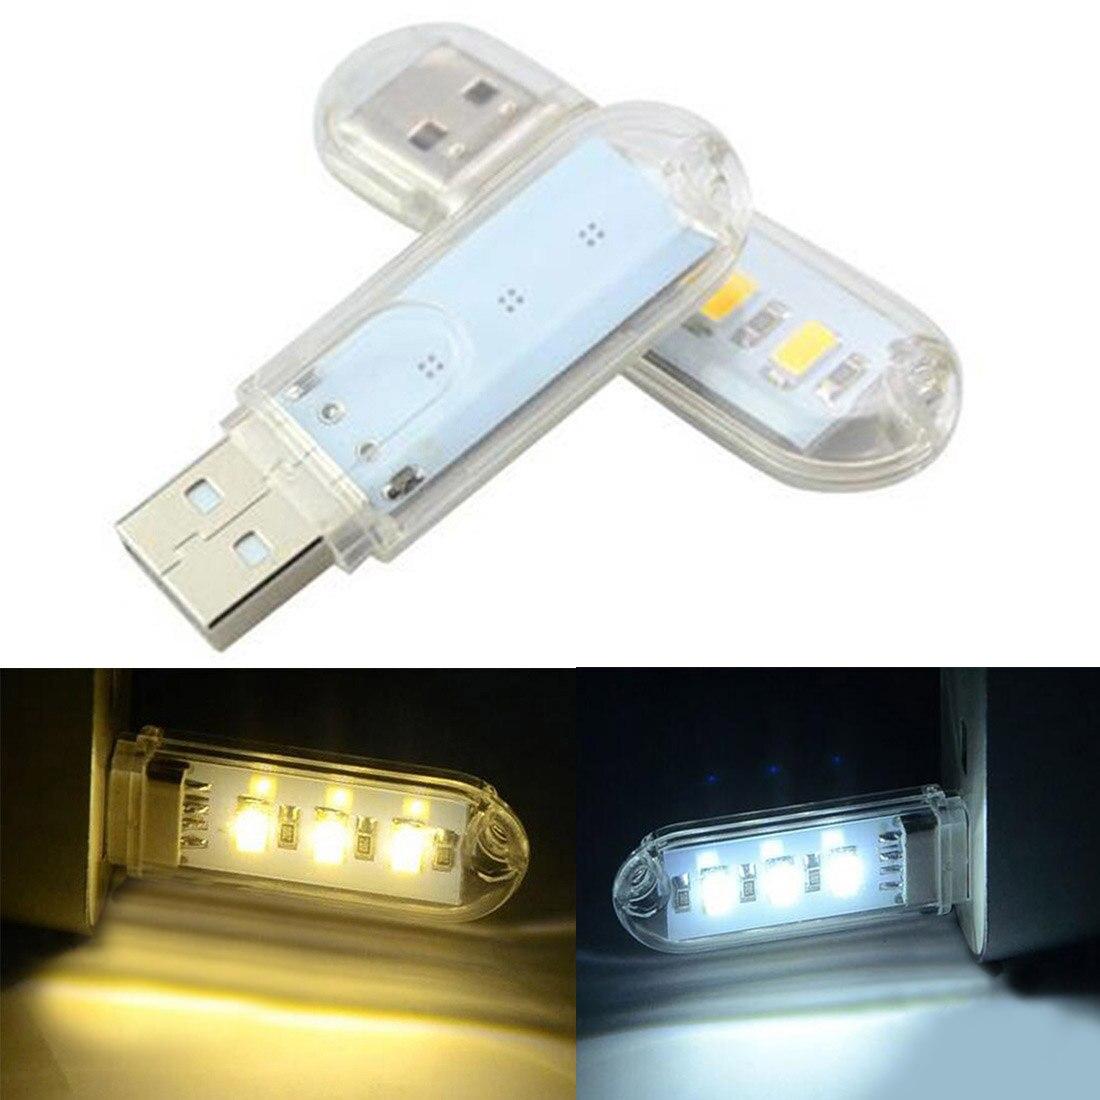 1Pc Mini Tragbare USB LED Buch Licht 3LEDs DC 5V Für PC Laptops Computer Notebook Power Bank camping Lampe Lesen Birne